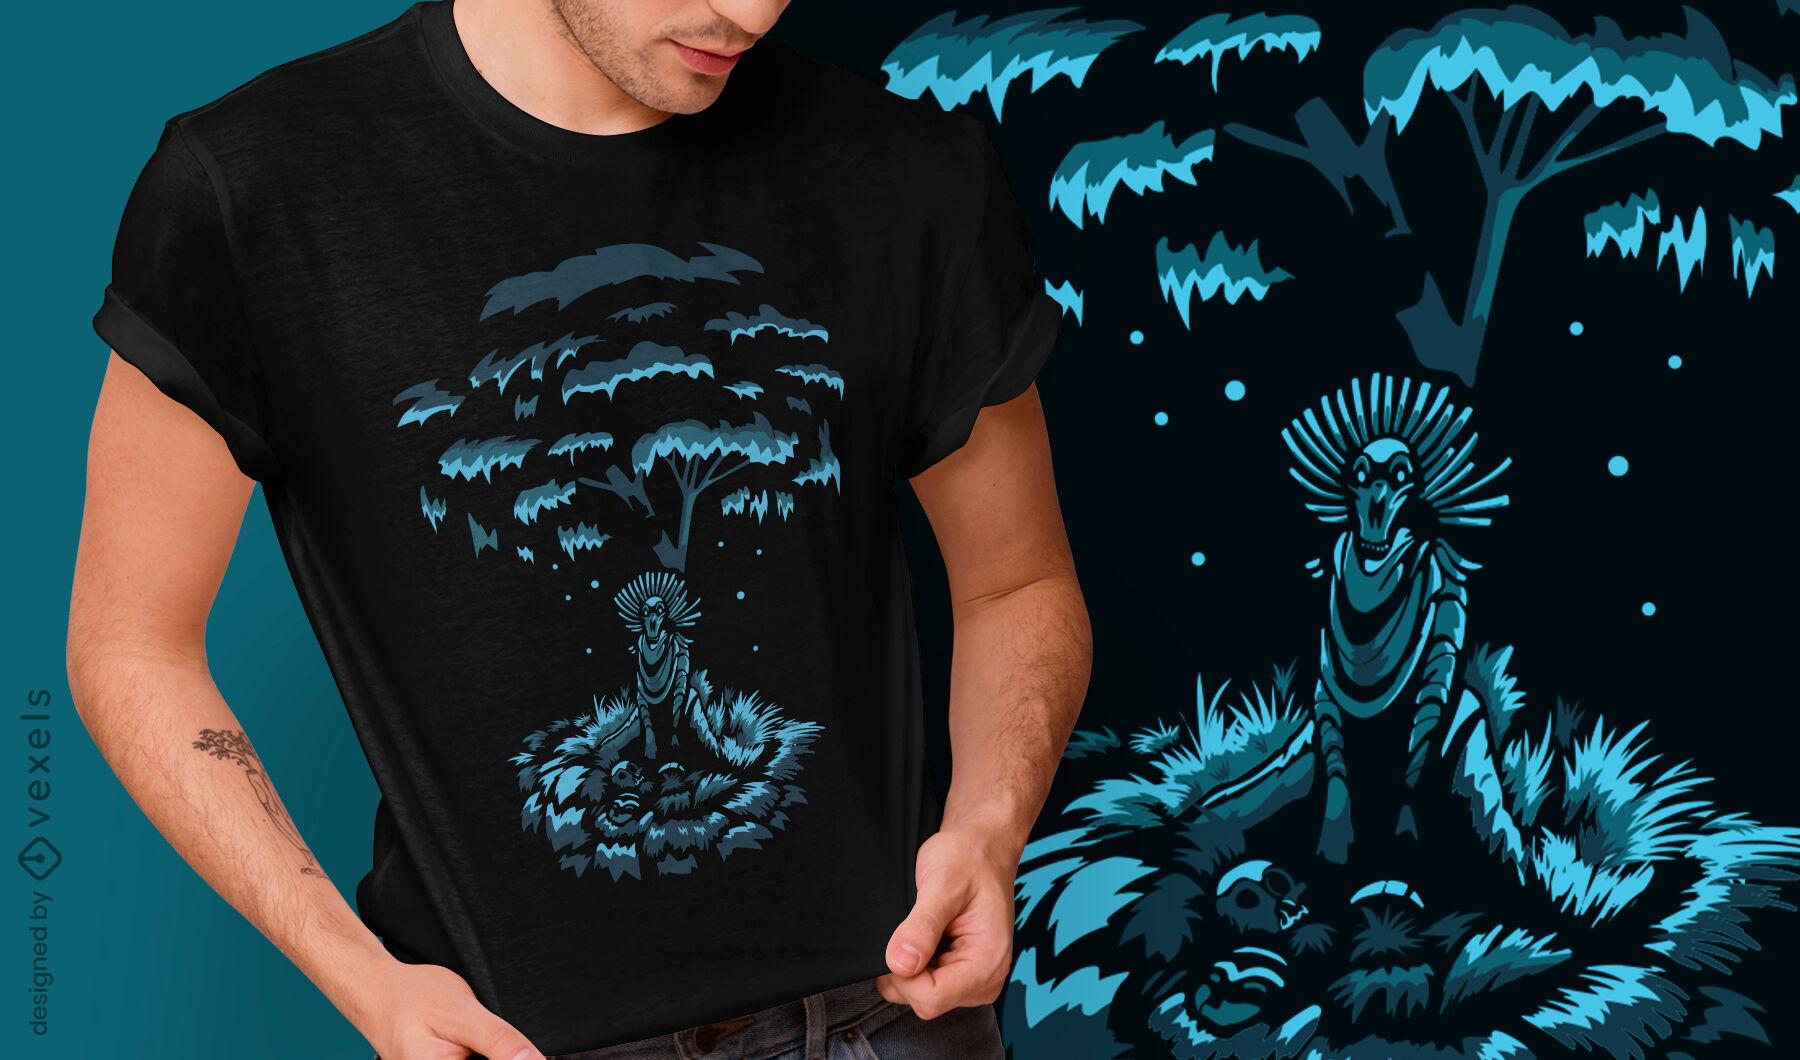 Diseño de camiseta de demonio espeluznante de criatura oscura